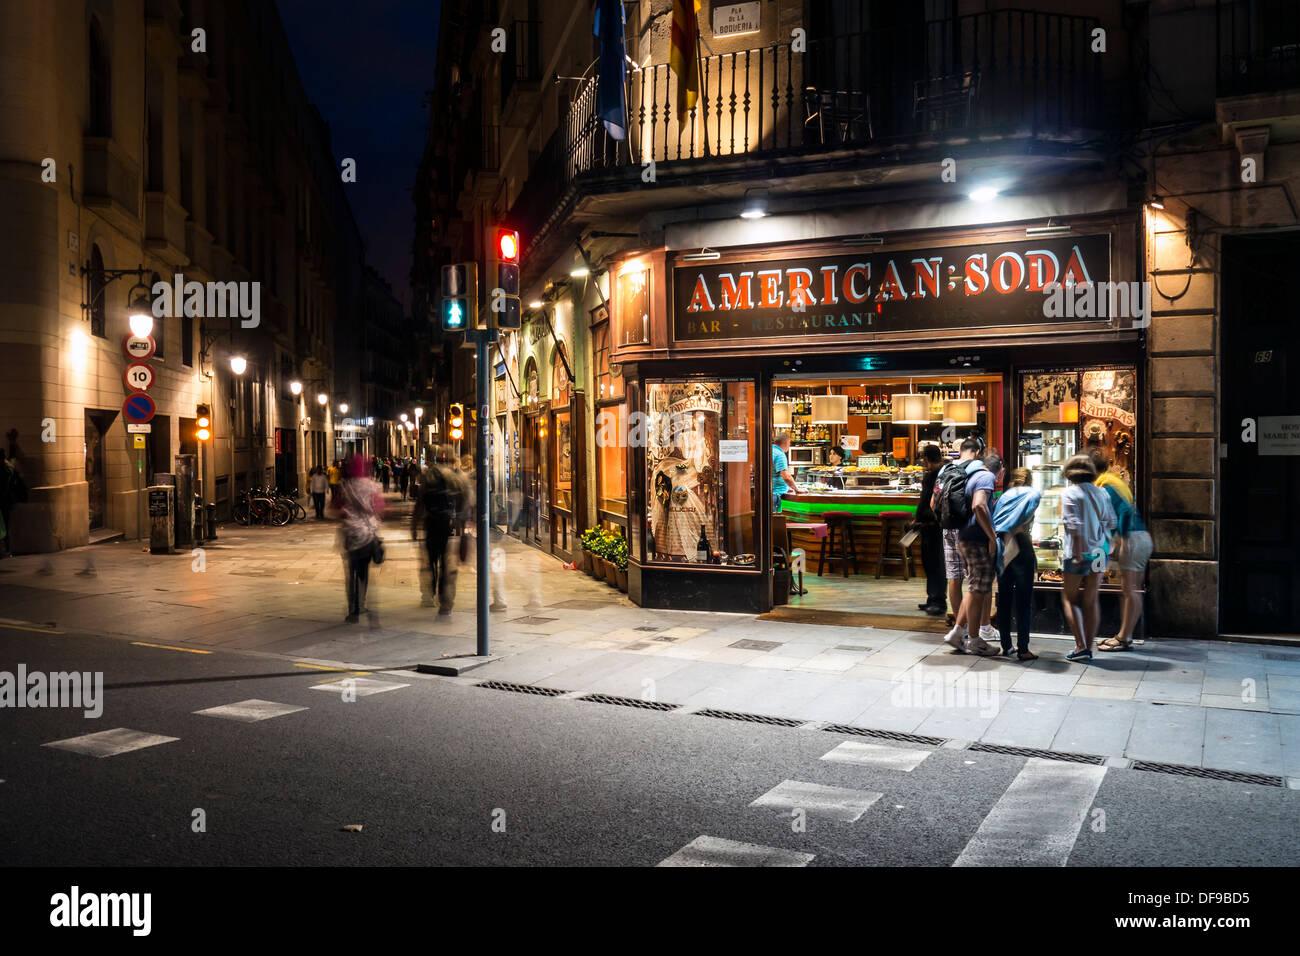 city street corner at night - photo #19